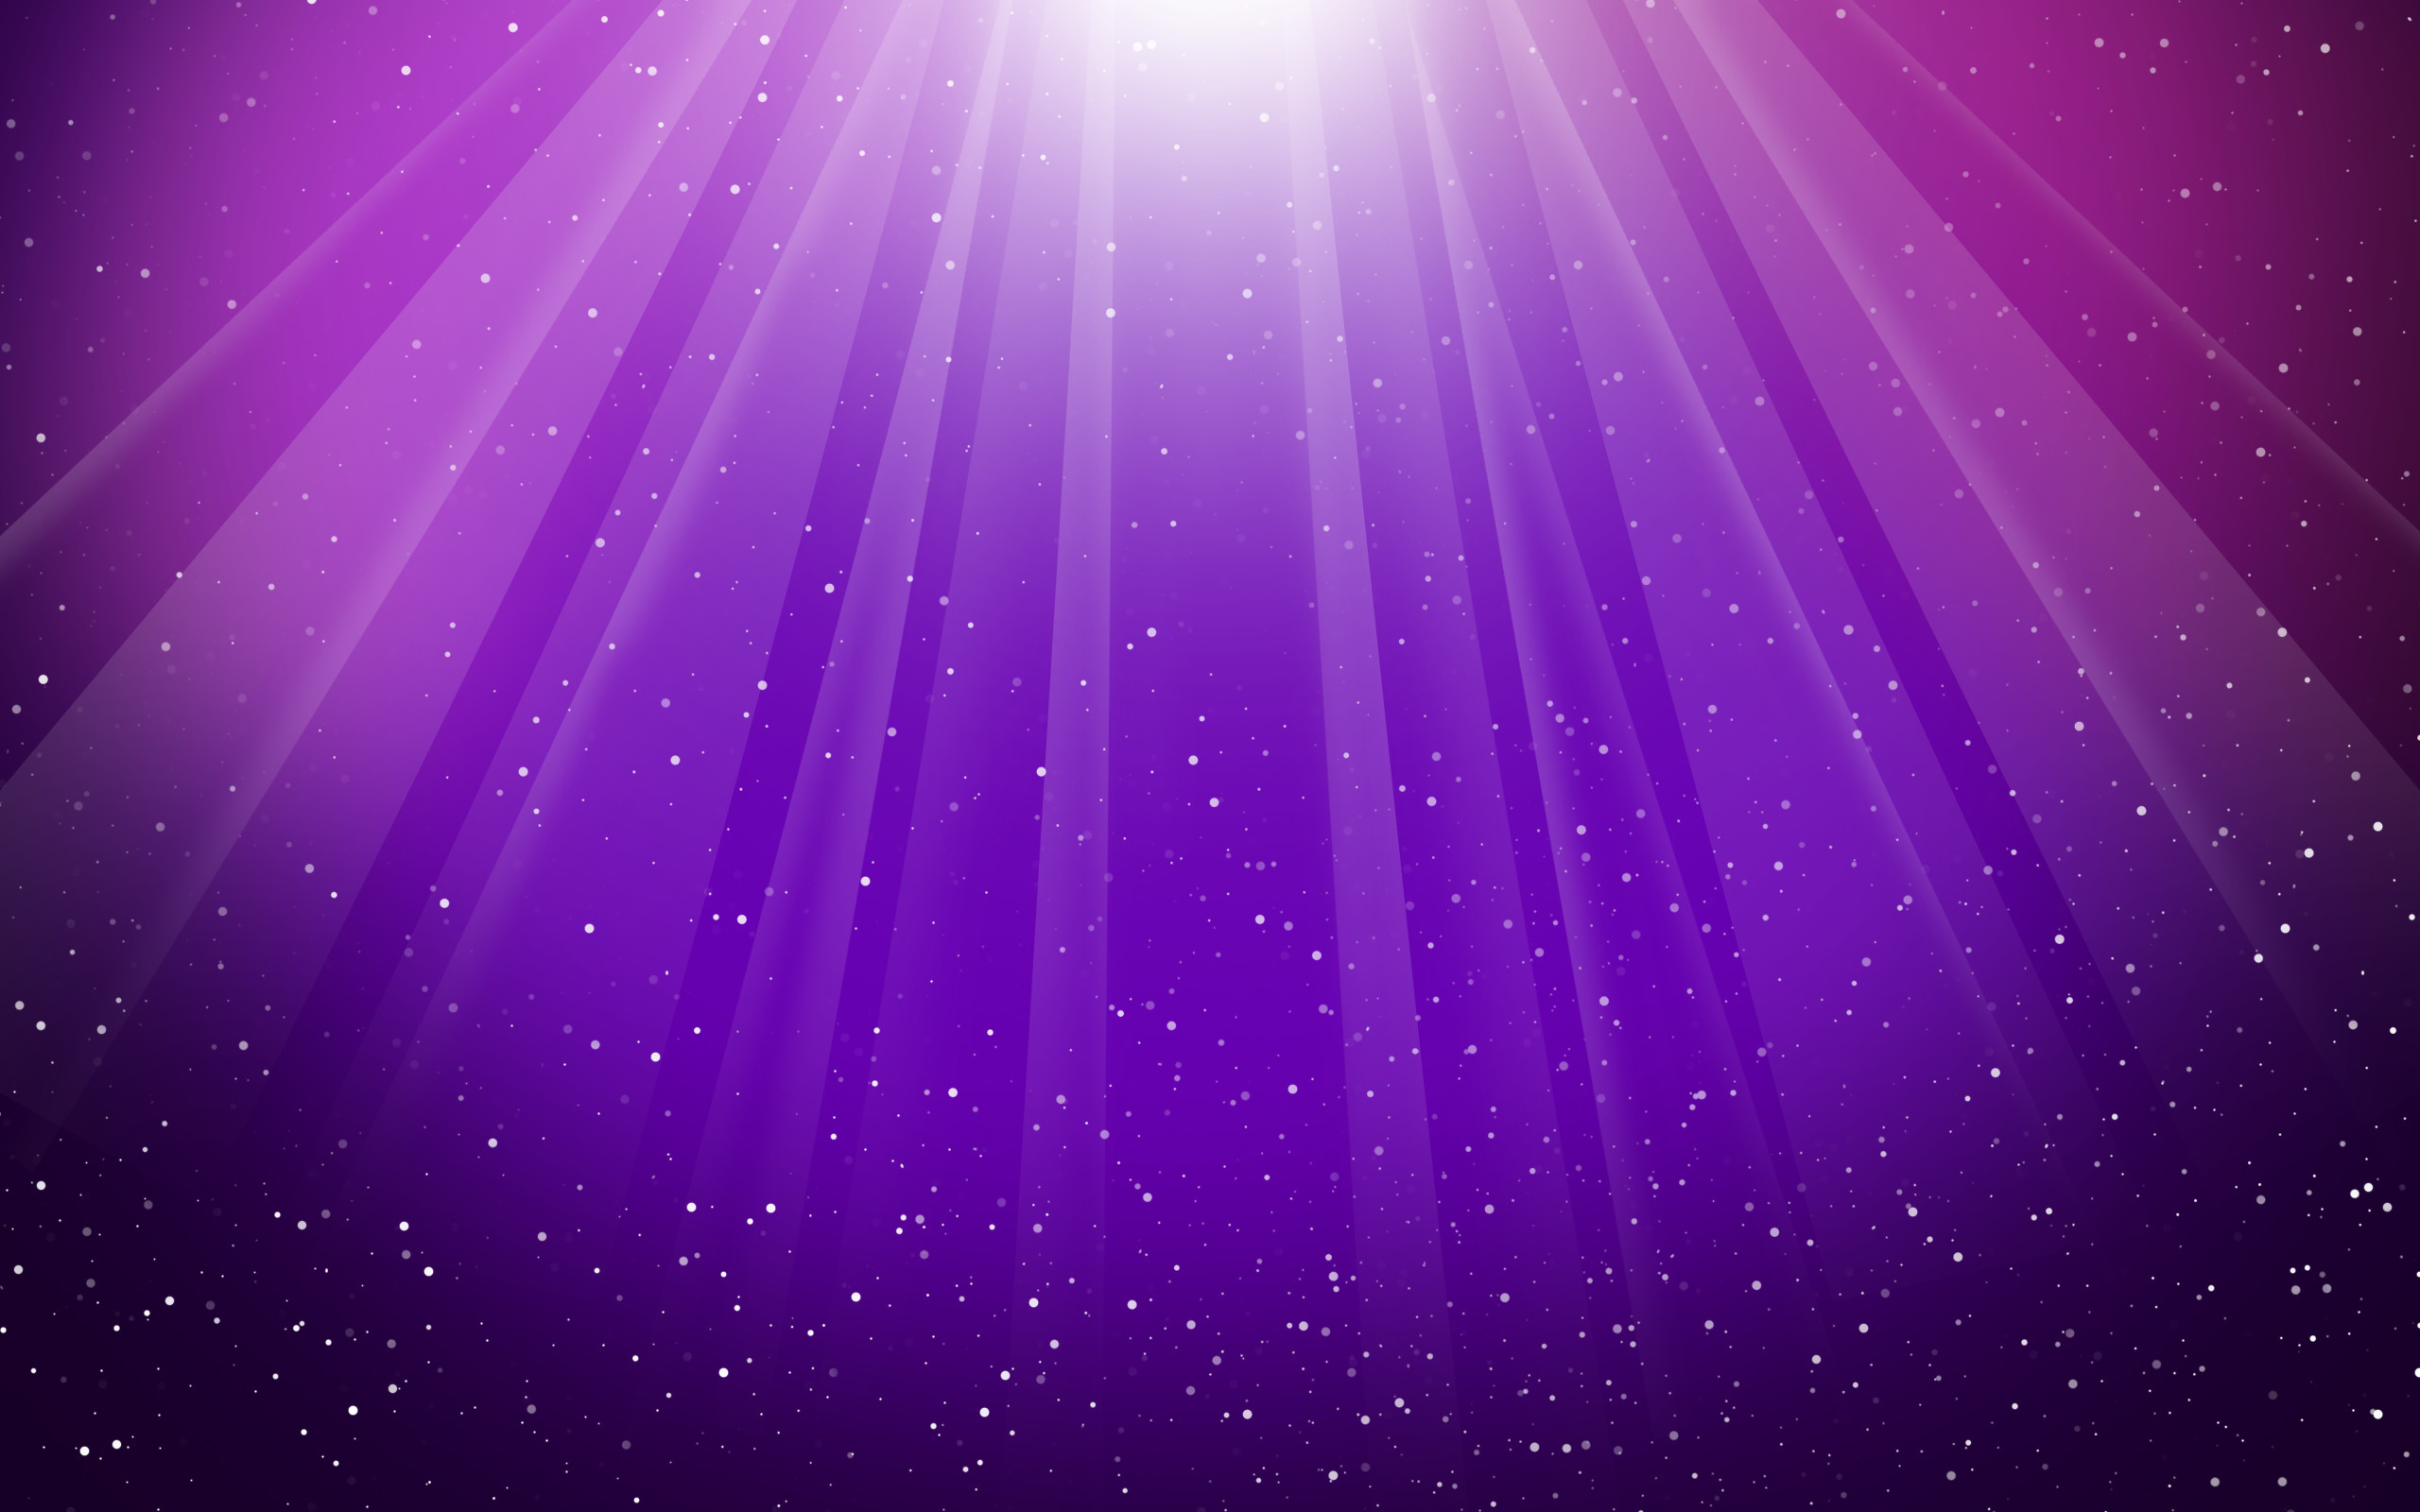 Free Purple Wallpaper